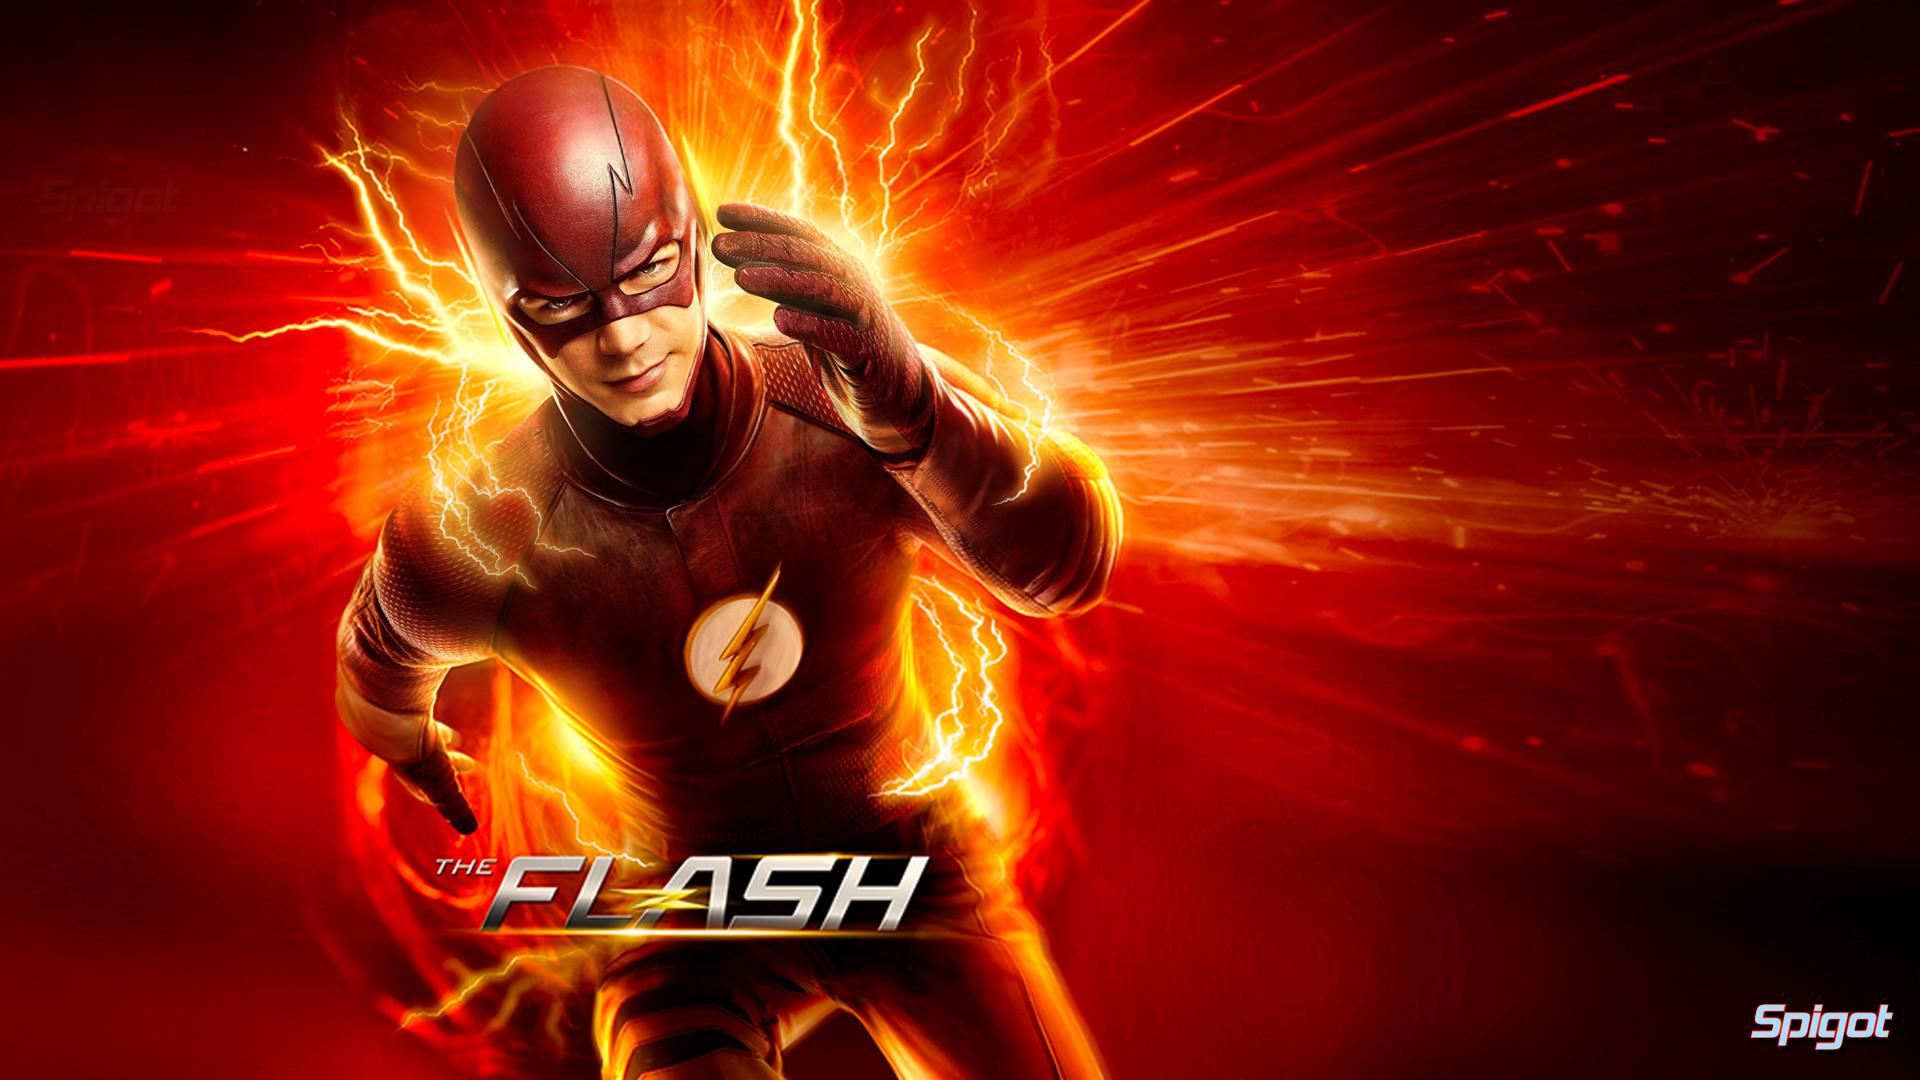 1920x1080 The Flash CW Wallpaper HD